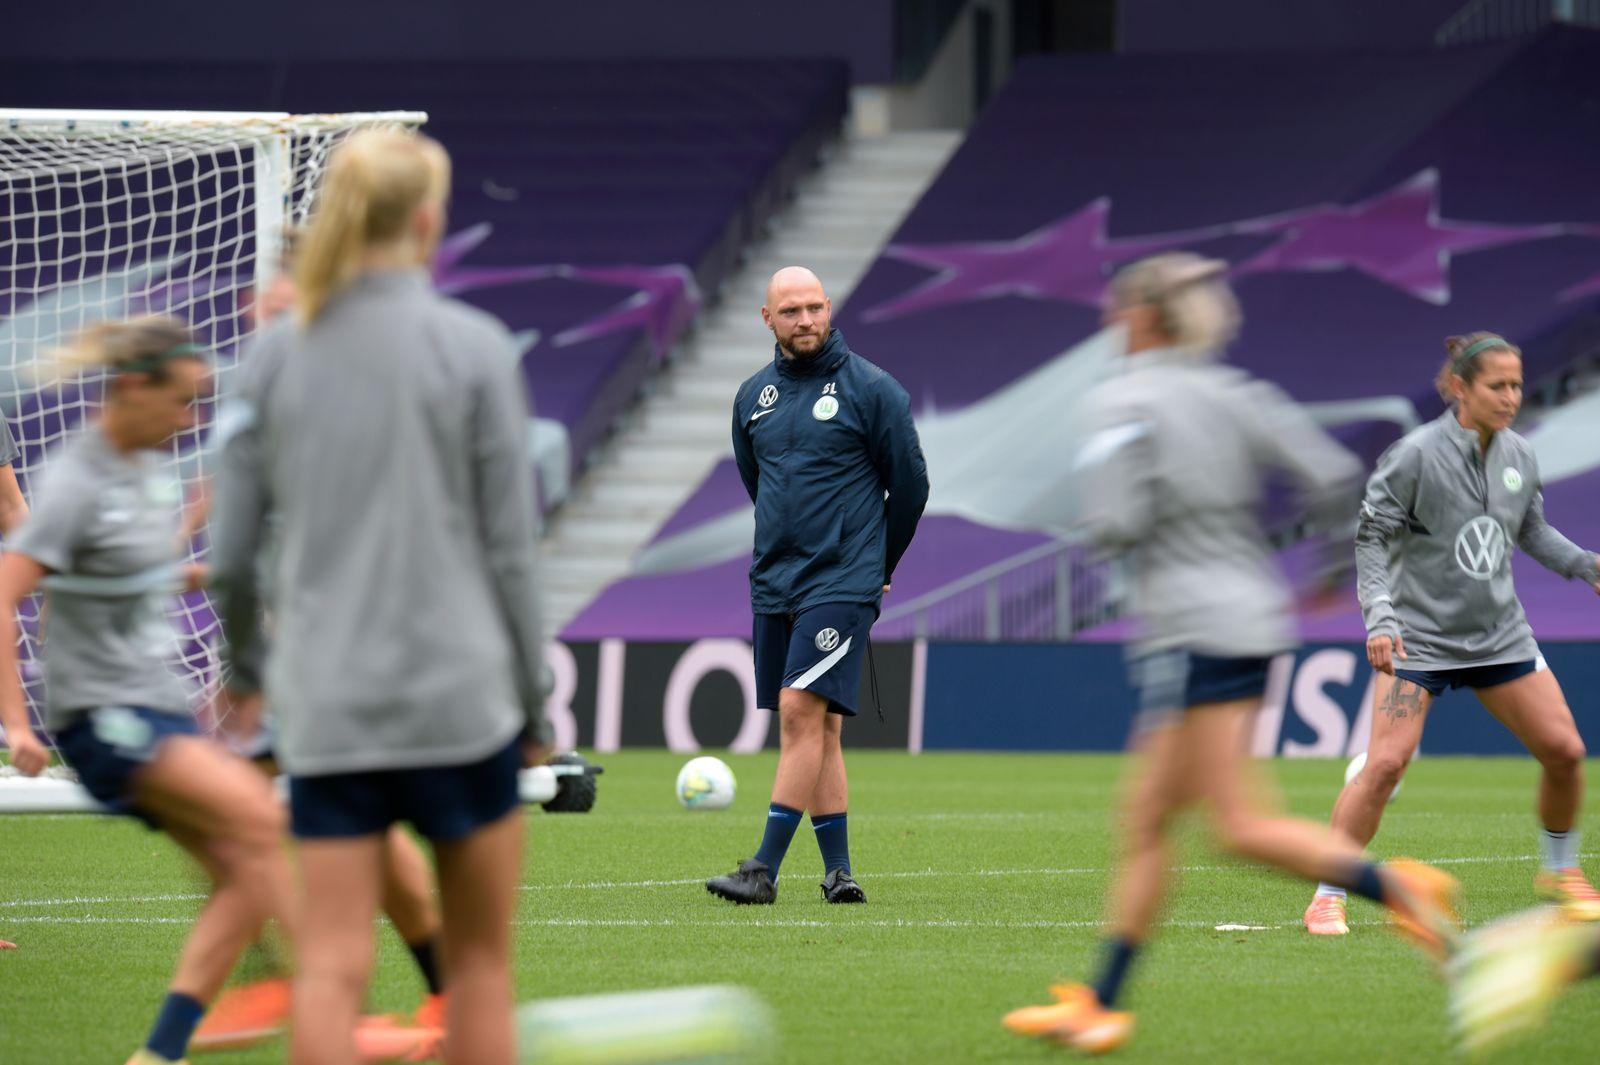 VfL Wolfsburg Women's Training Session - UEFA Champions League